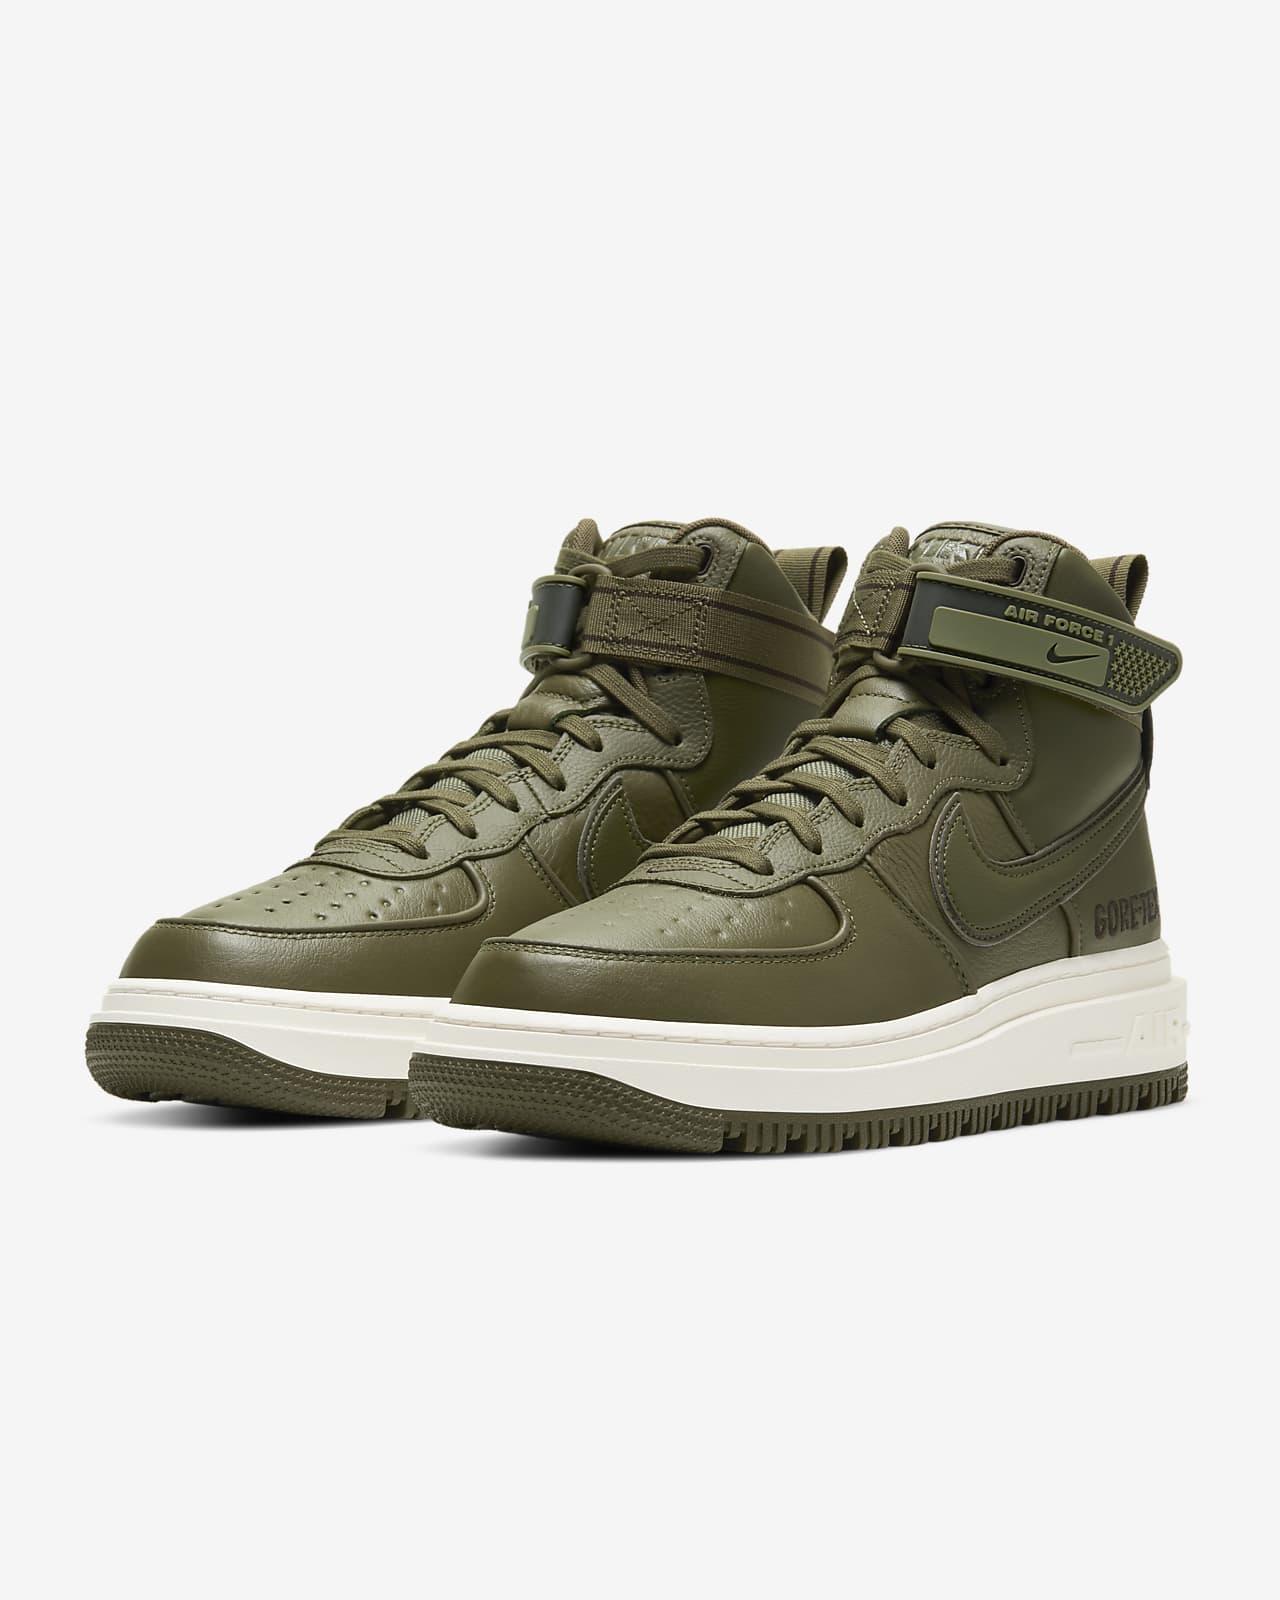 Nike Air Force 1 GTX Boot Men's Boot